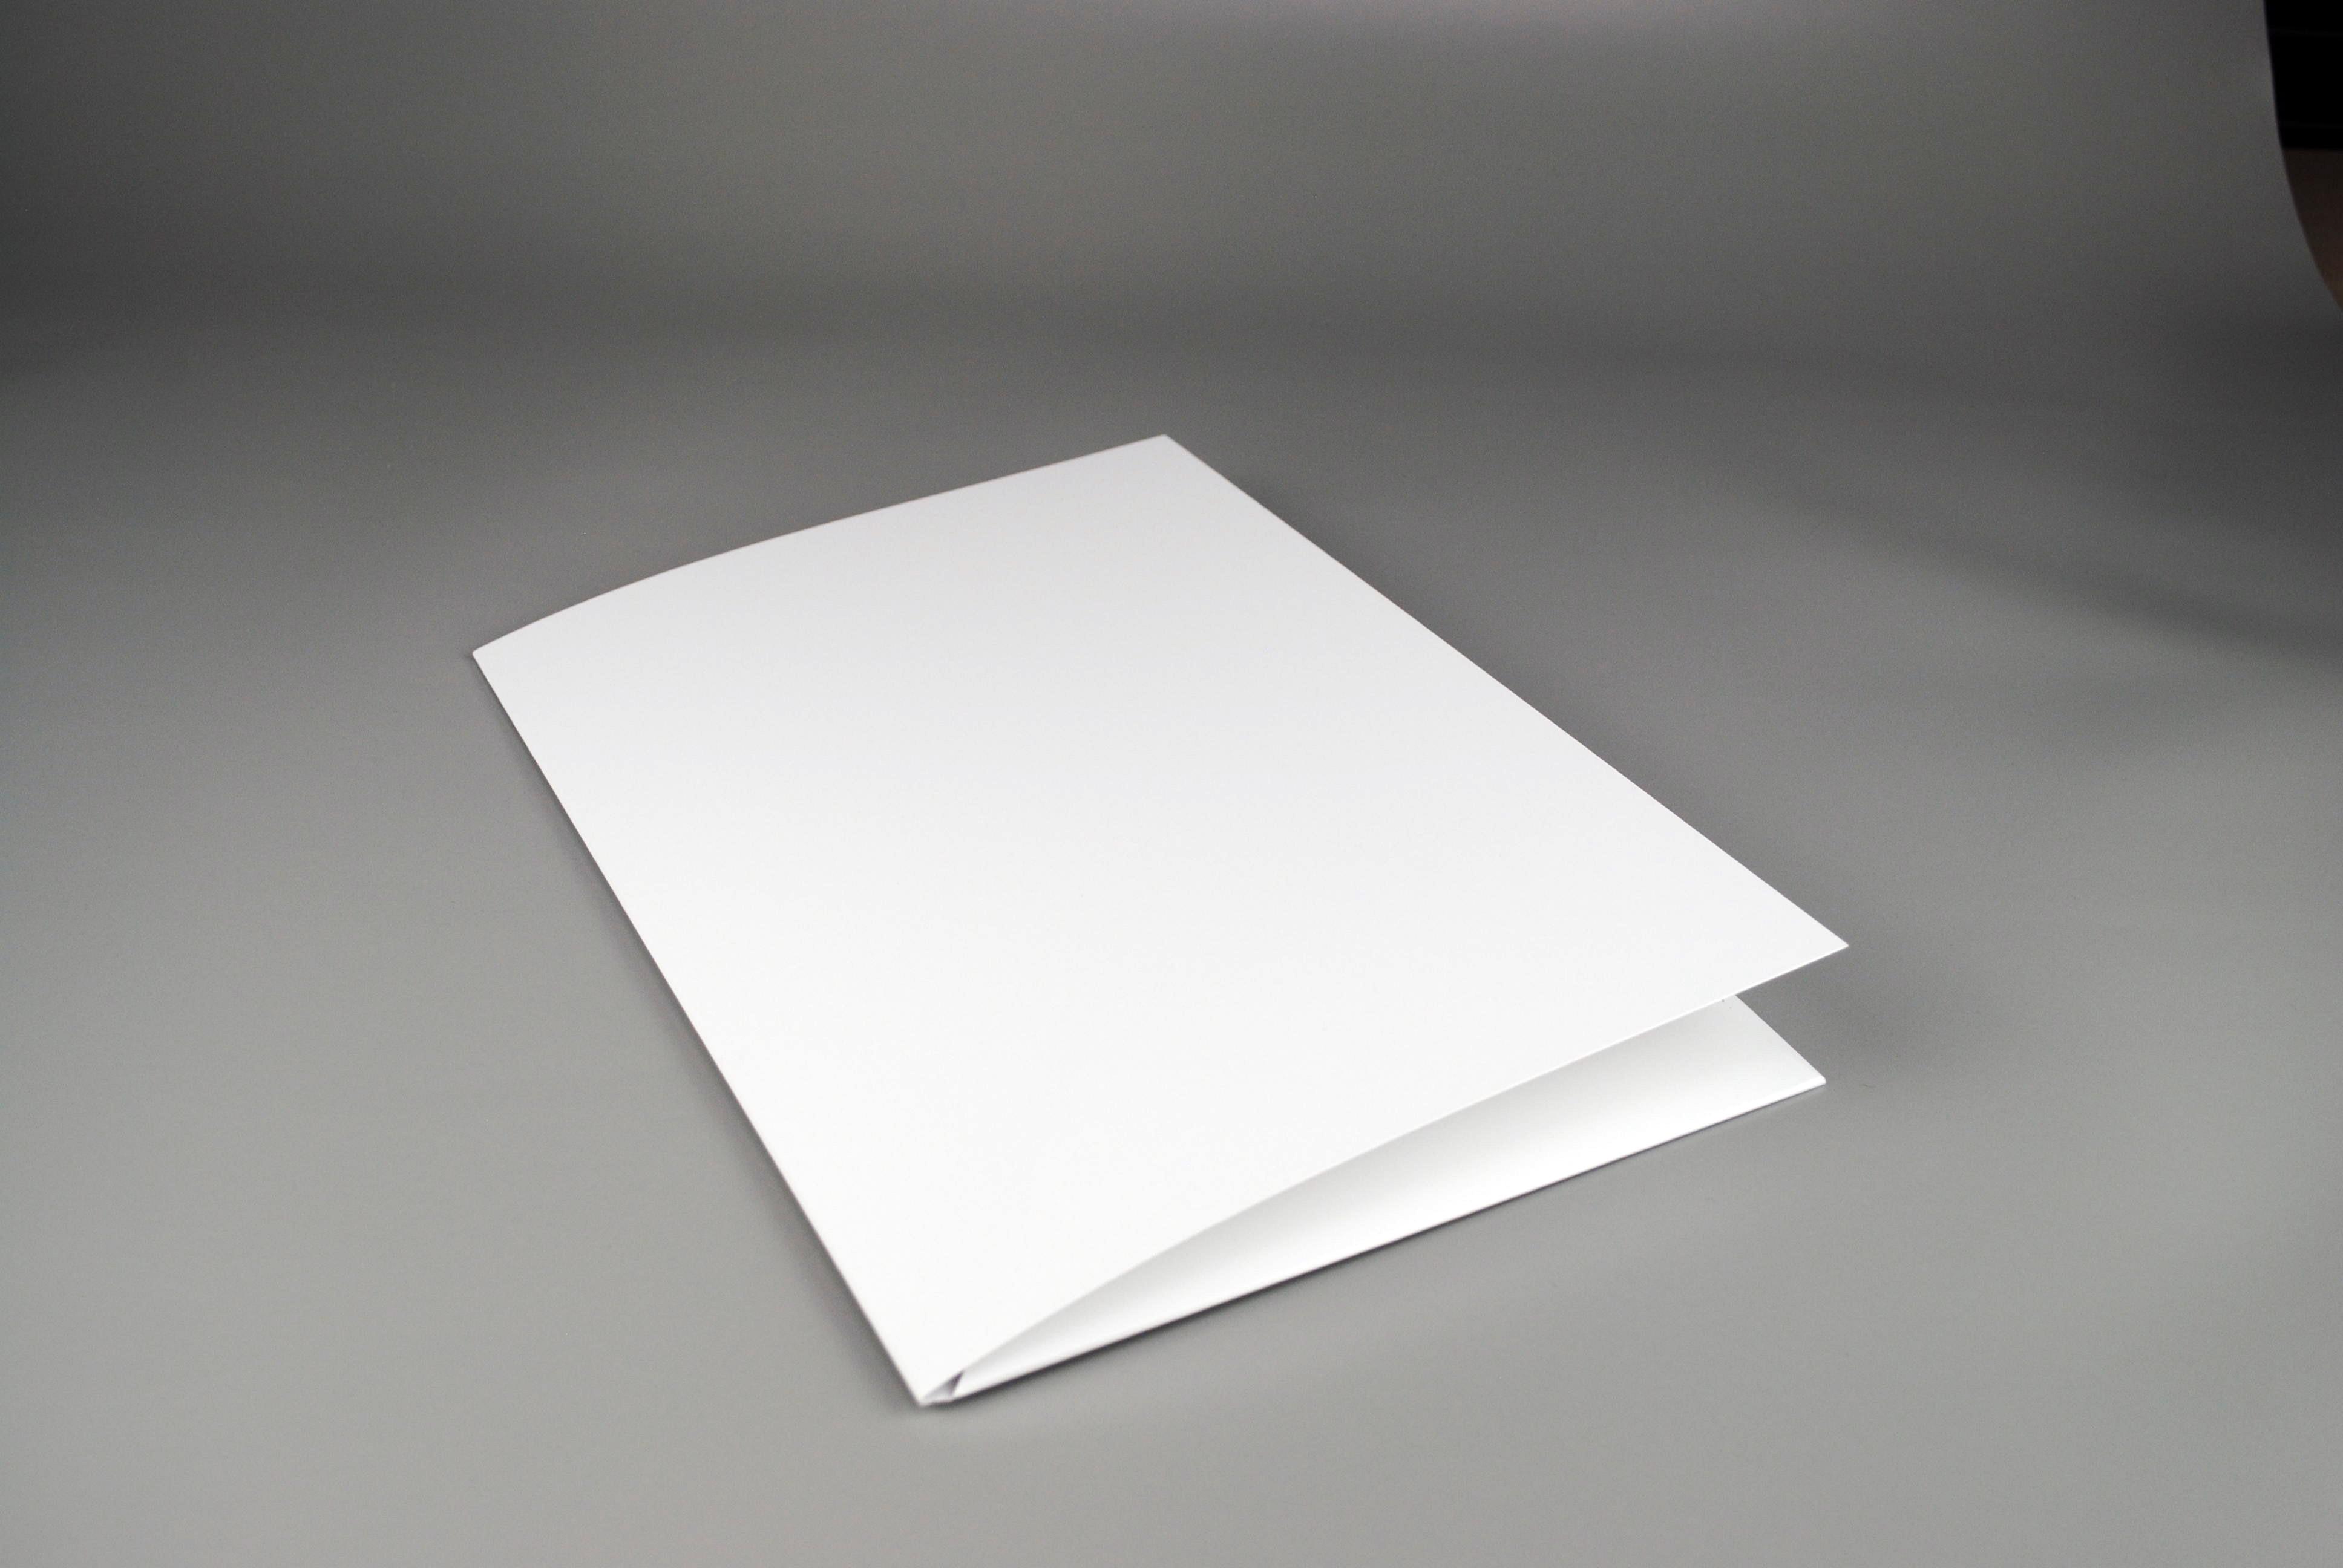 Blanko Präsentationsmappen